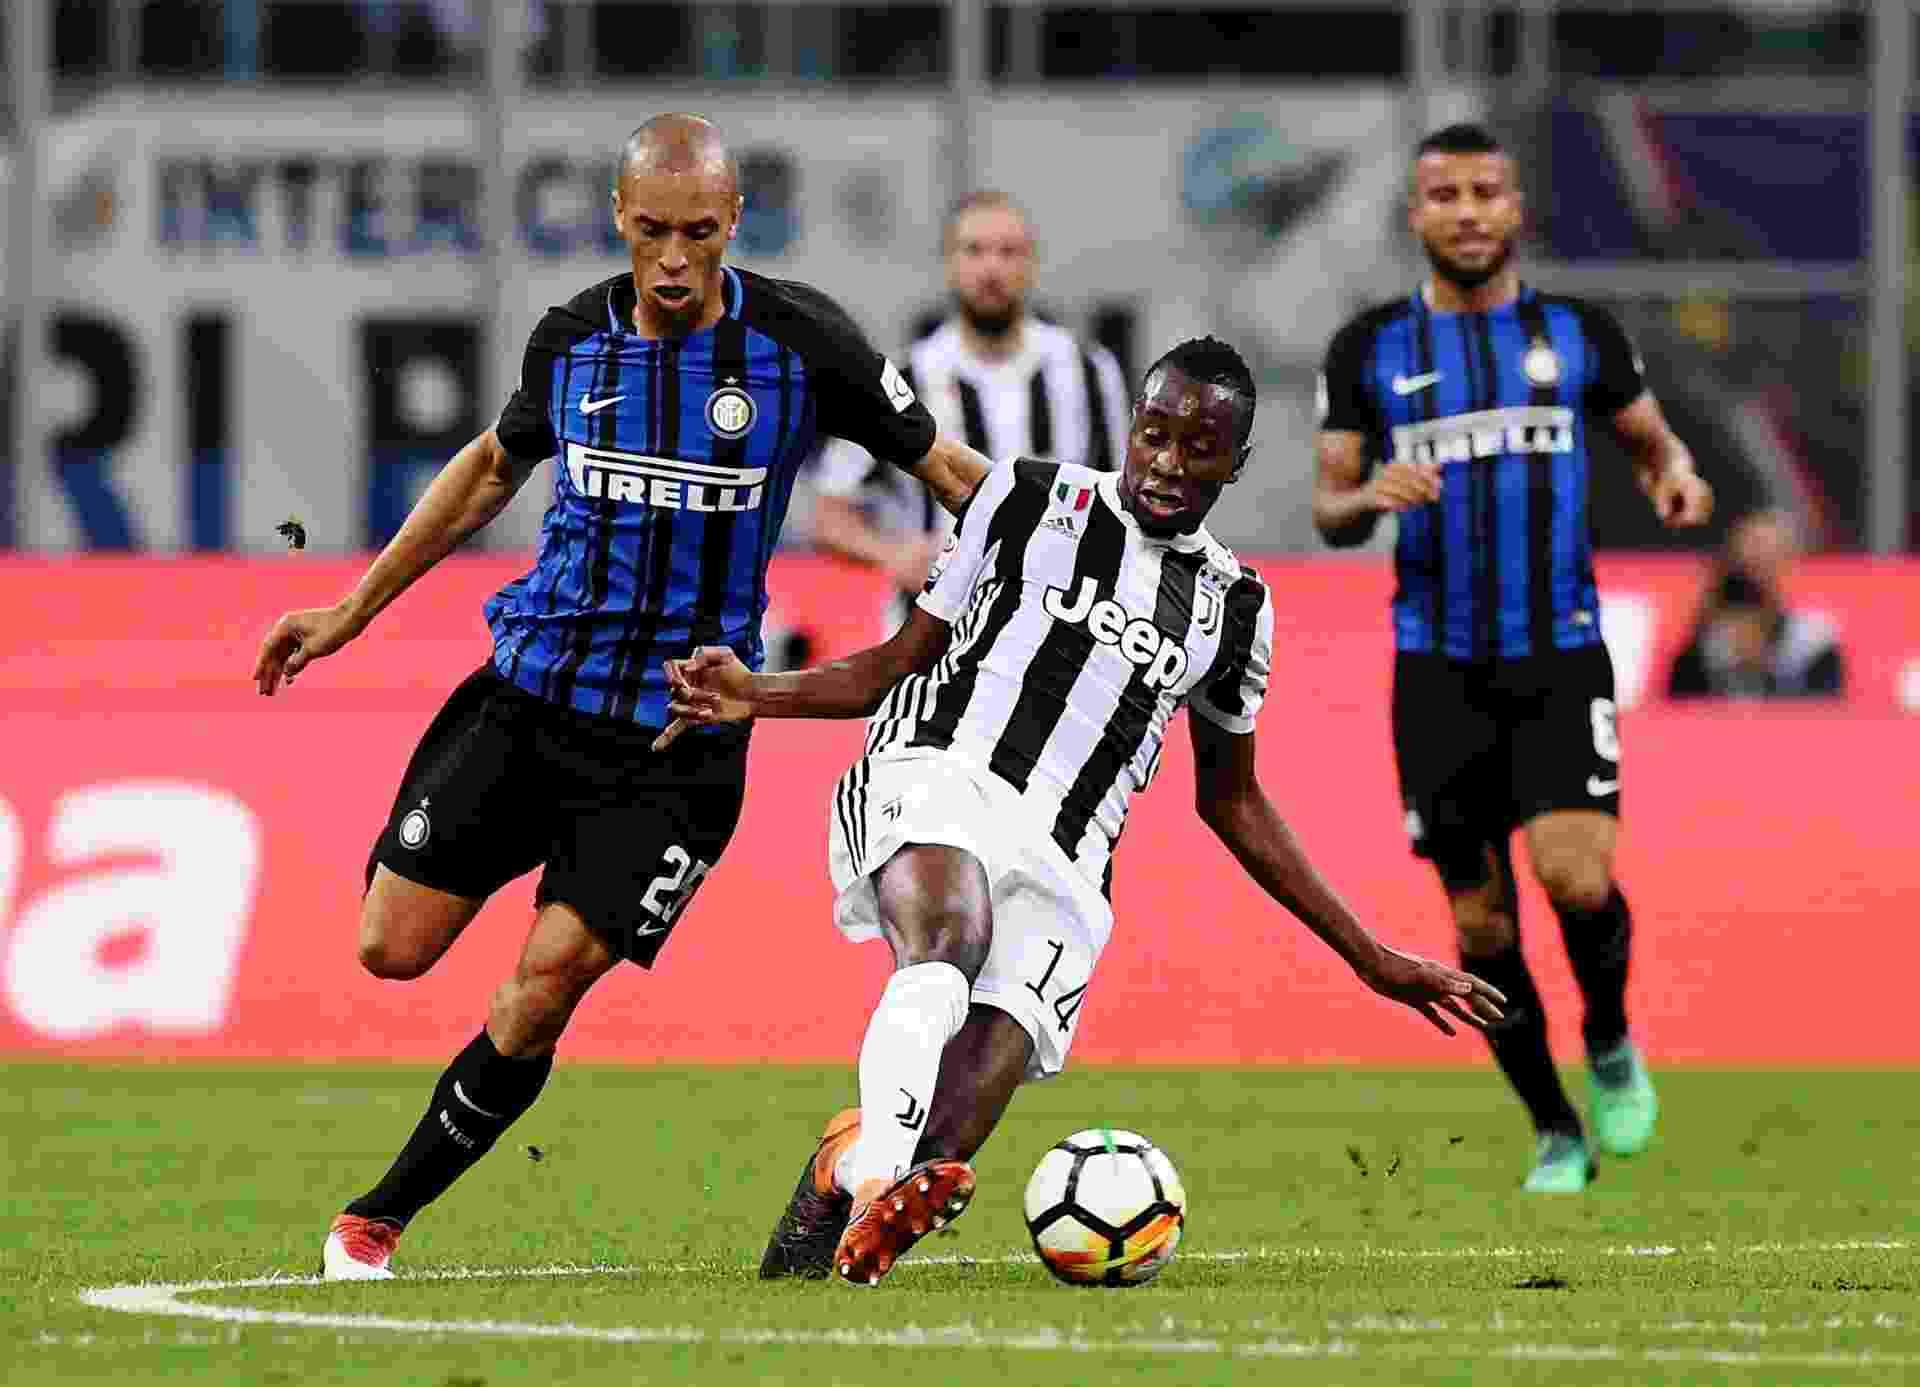 Miranda, da Inter, disputa bola com Matuidi, da Juventus - undefined